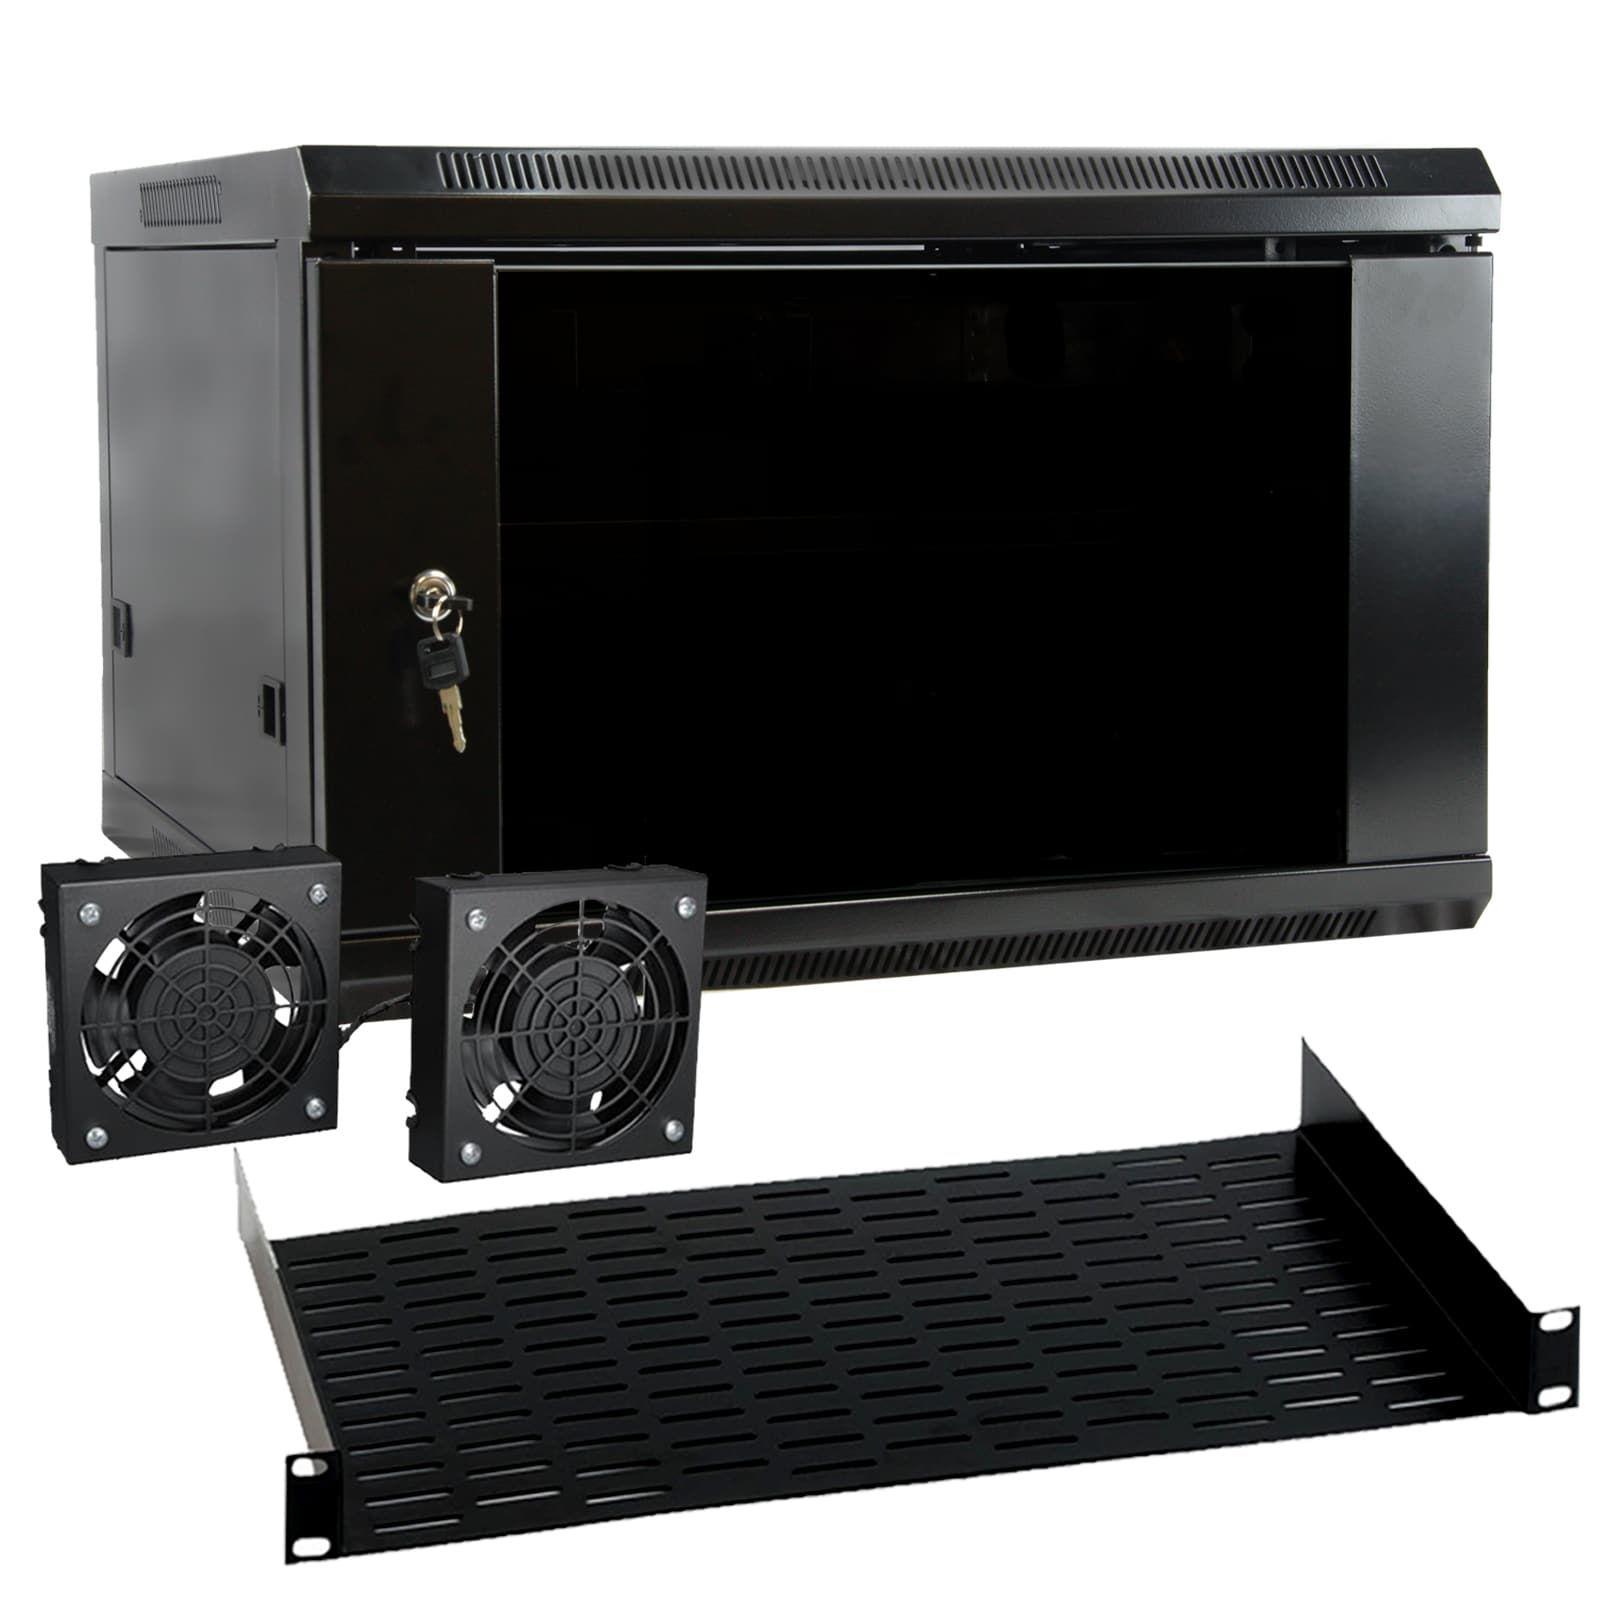 MegaMounts 6U Wall Mount Rack Enclosure Server Cabinet with Two